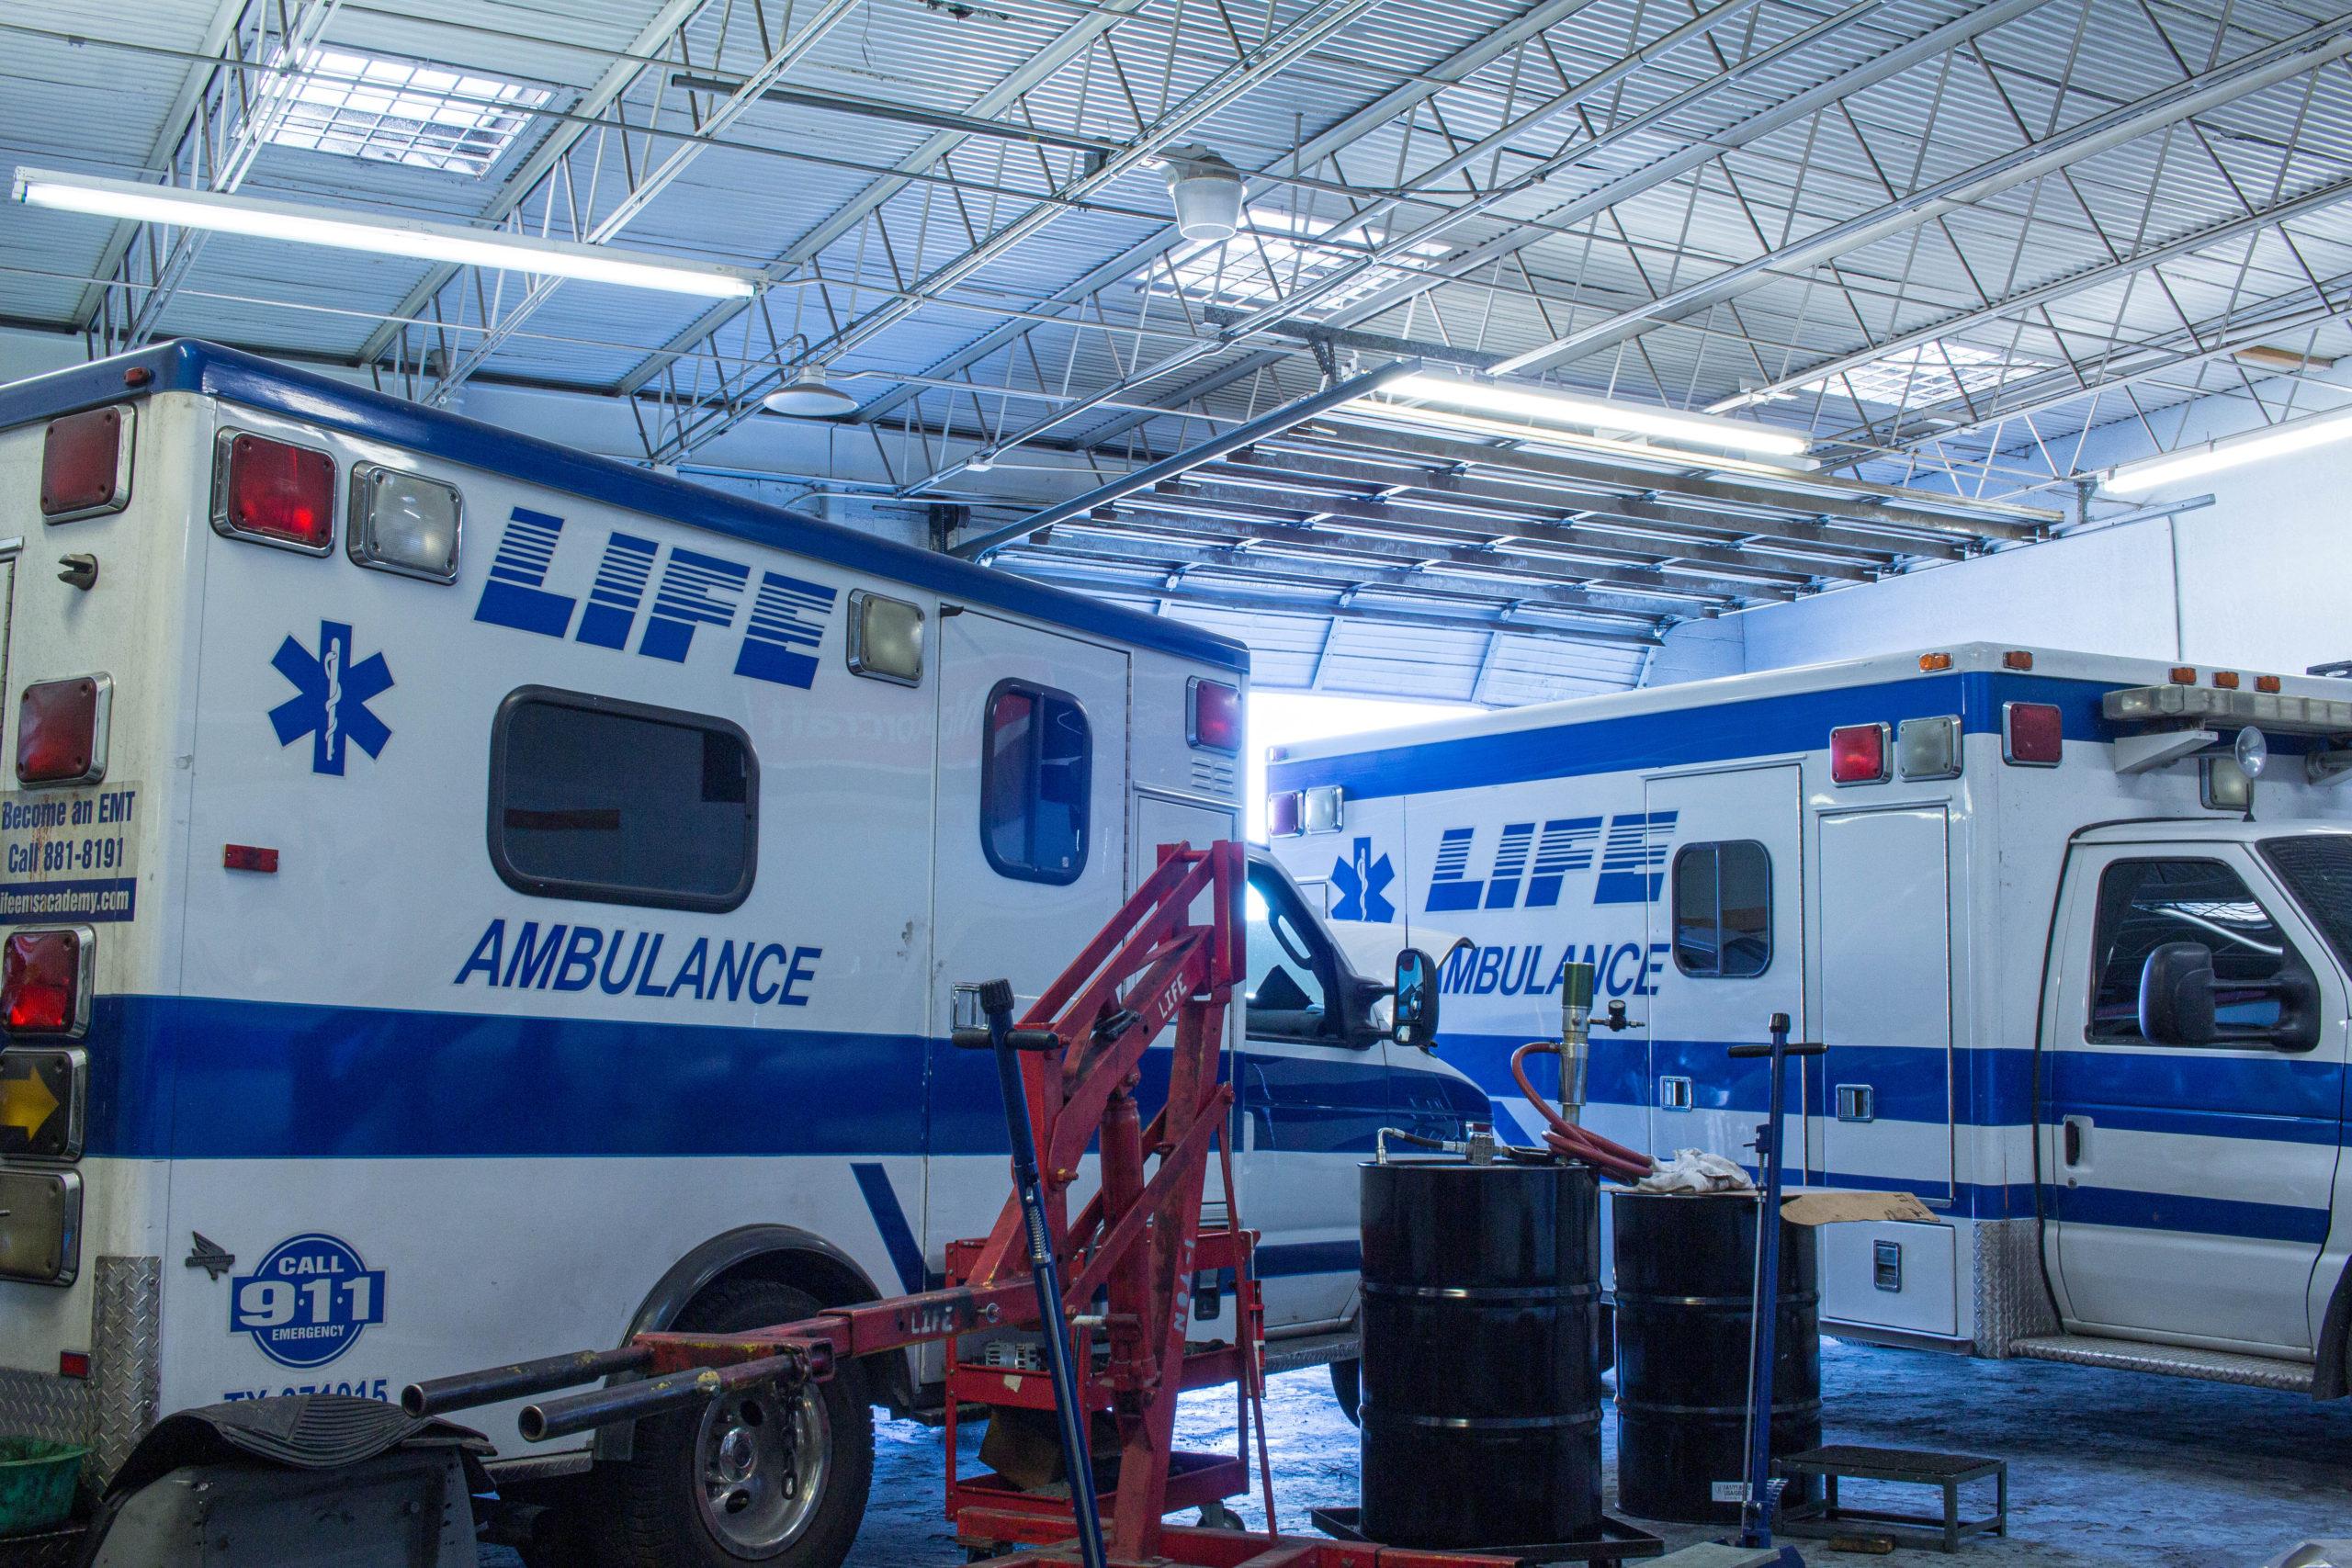 LIFE AMBULANCE on-site fleet maintenance